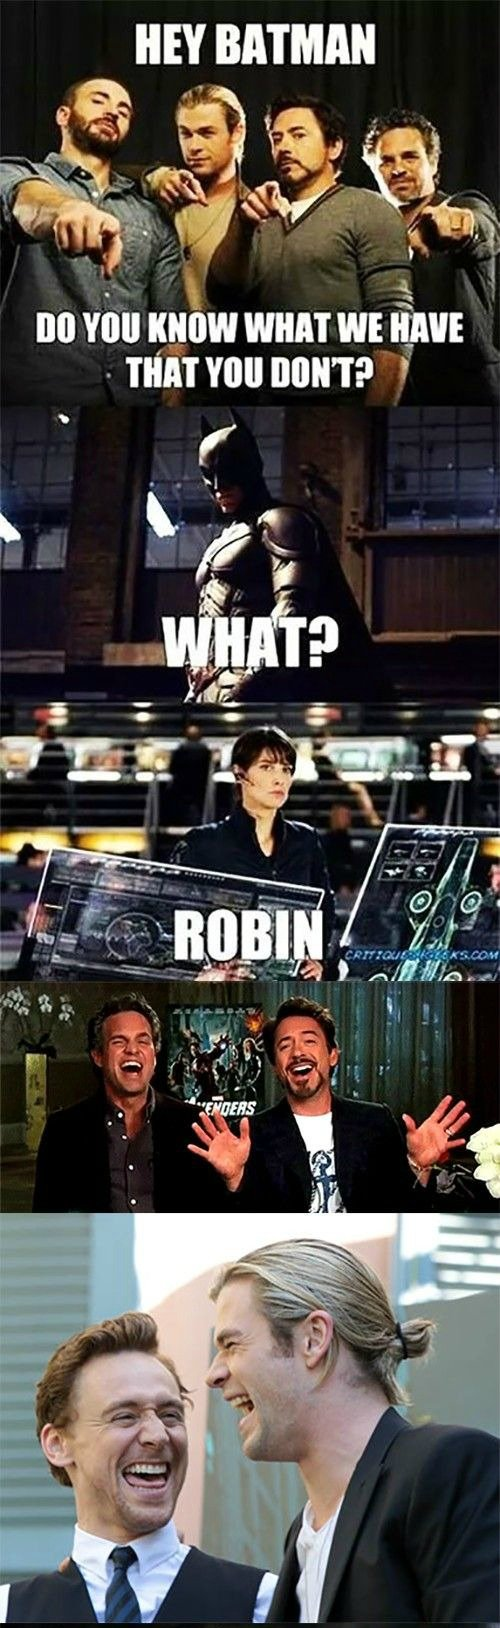 Avengers Vs Batman 2